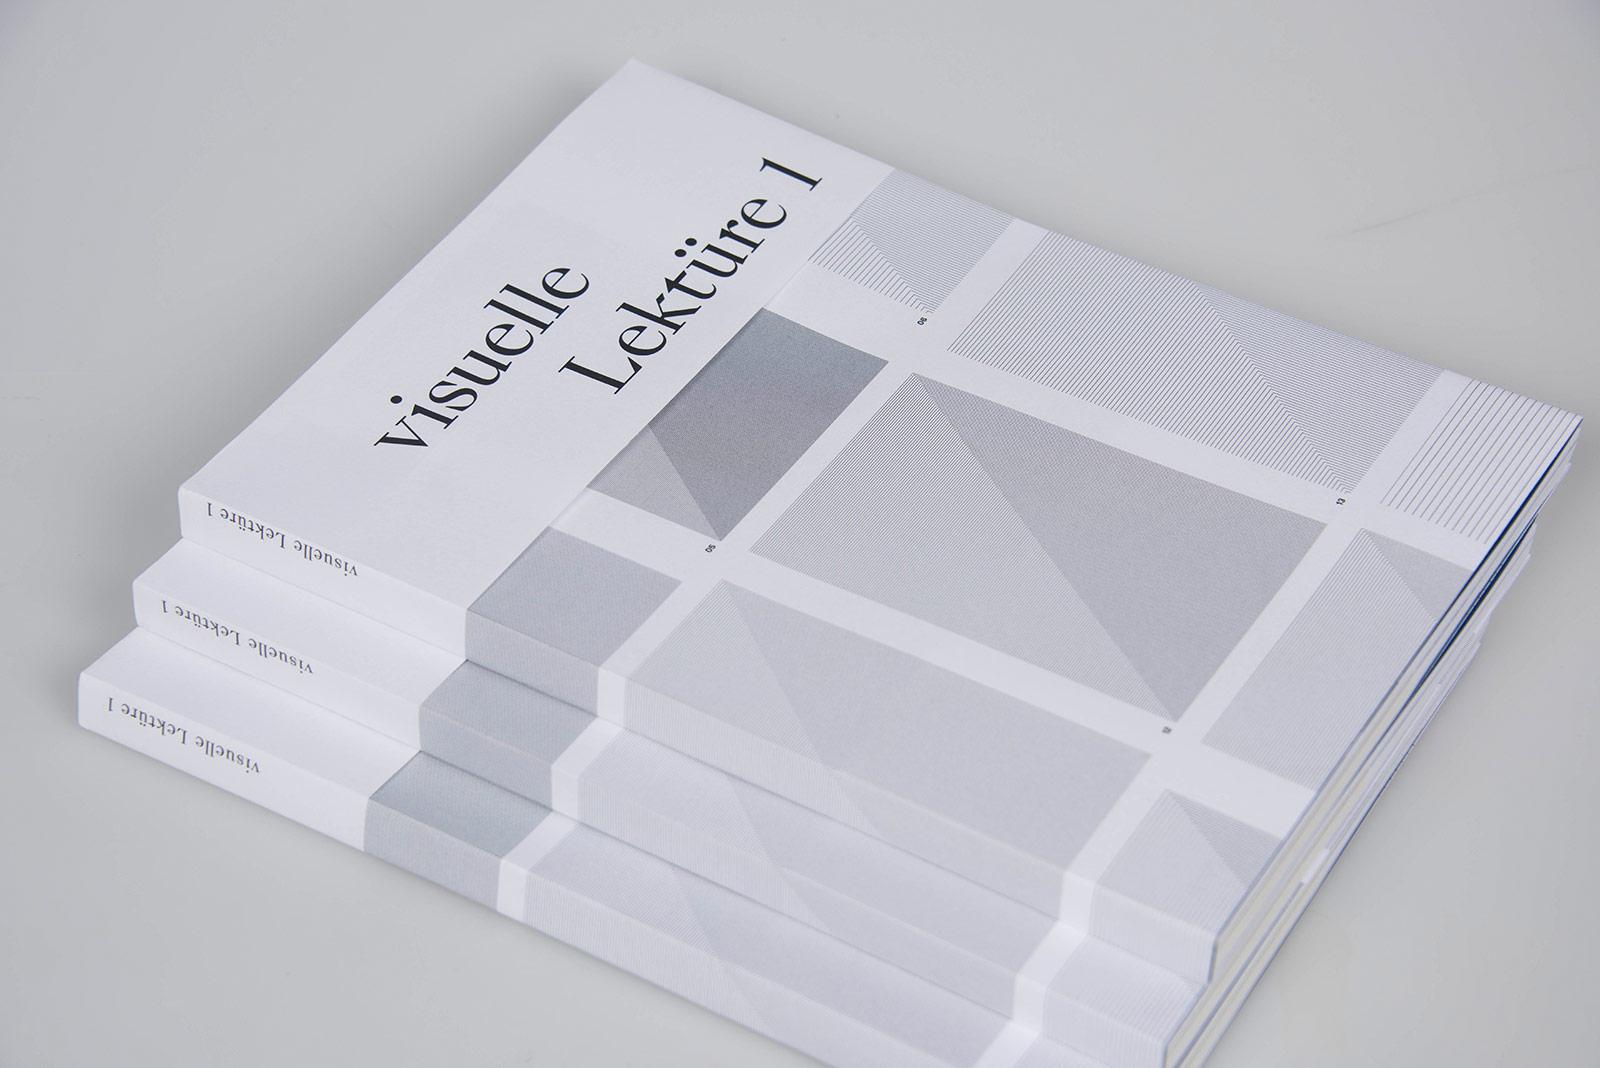 Martina Hareter – Visuelle Lektüre 1